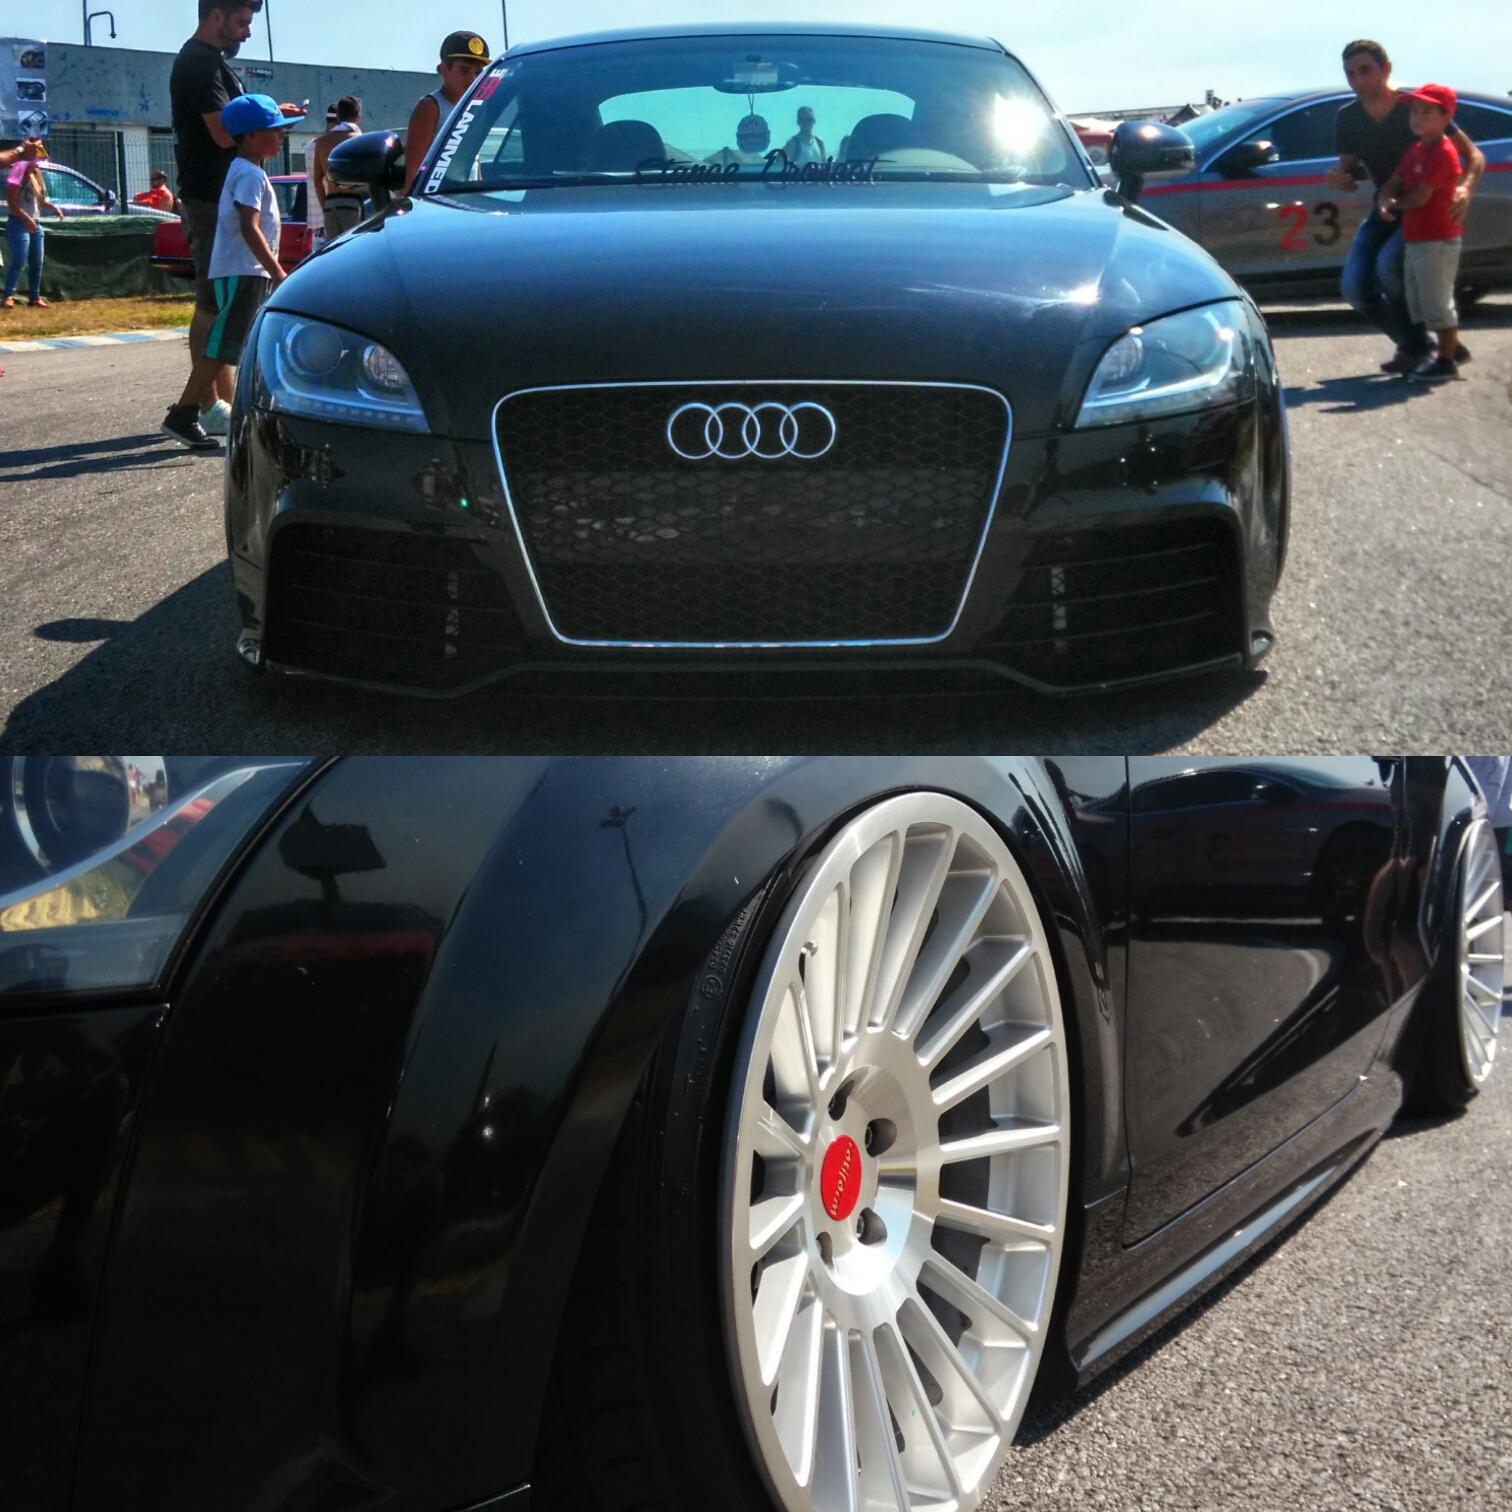 Audi A4 Ultrasport For Sale: Audi TT + Rotiform = So Fresh